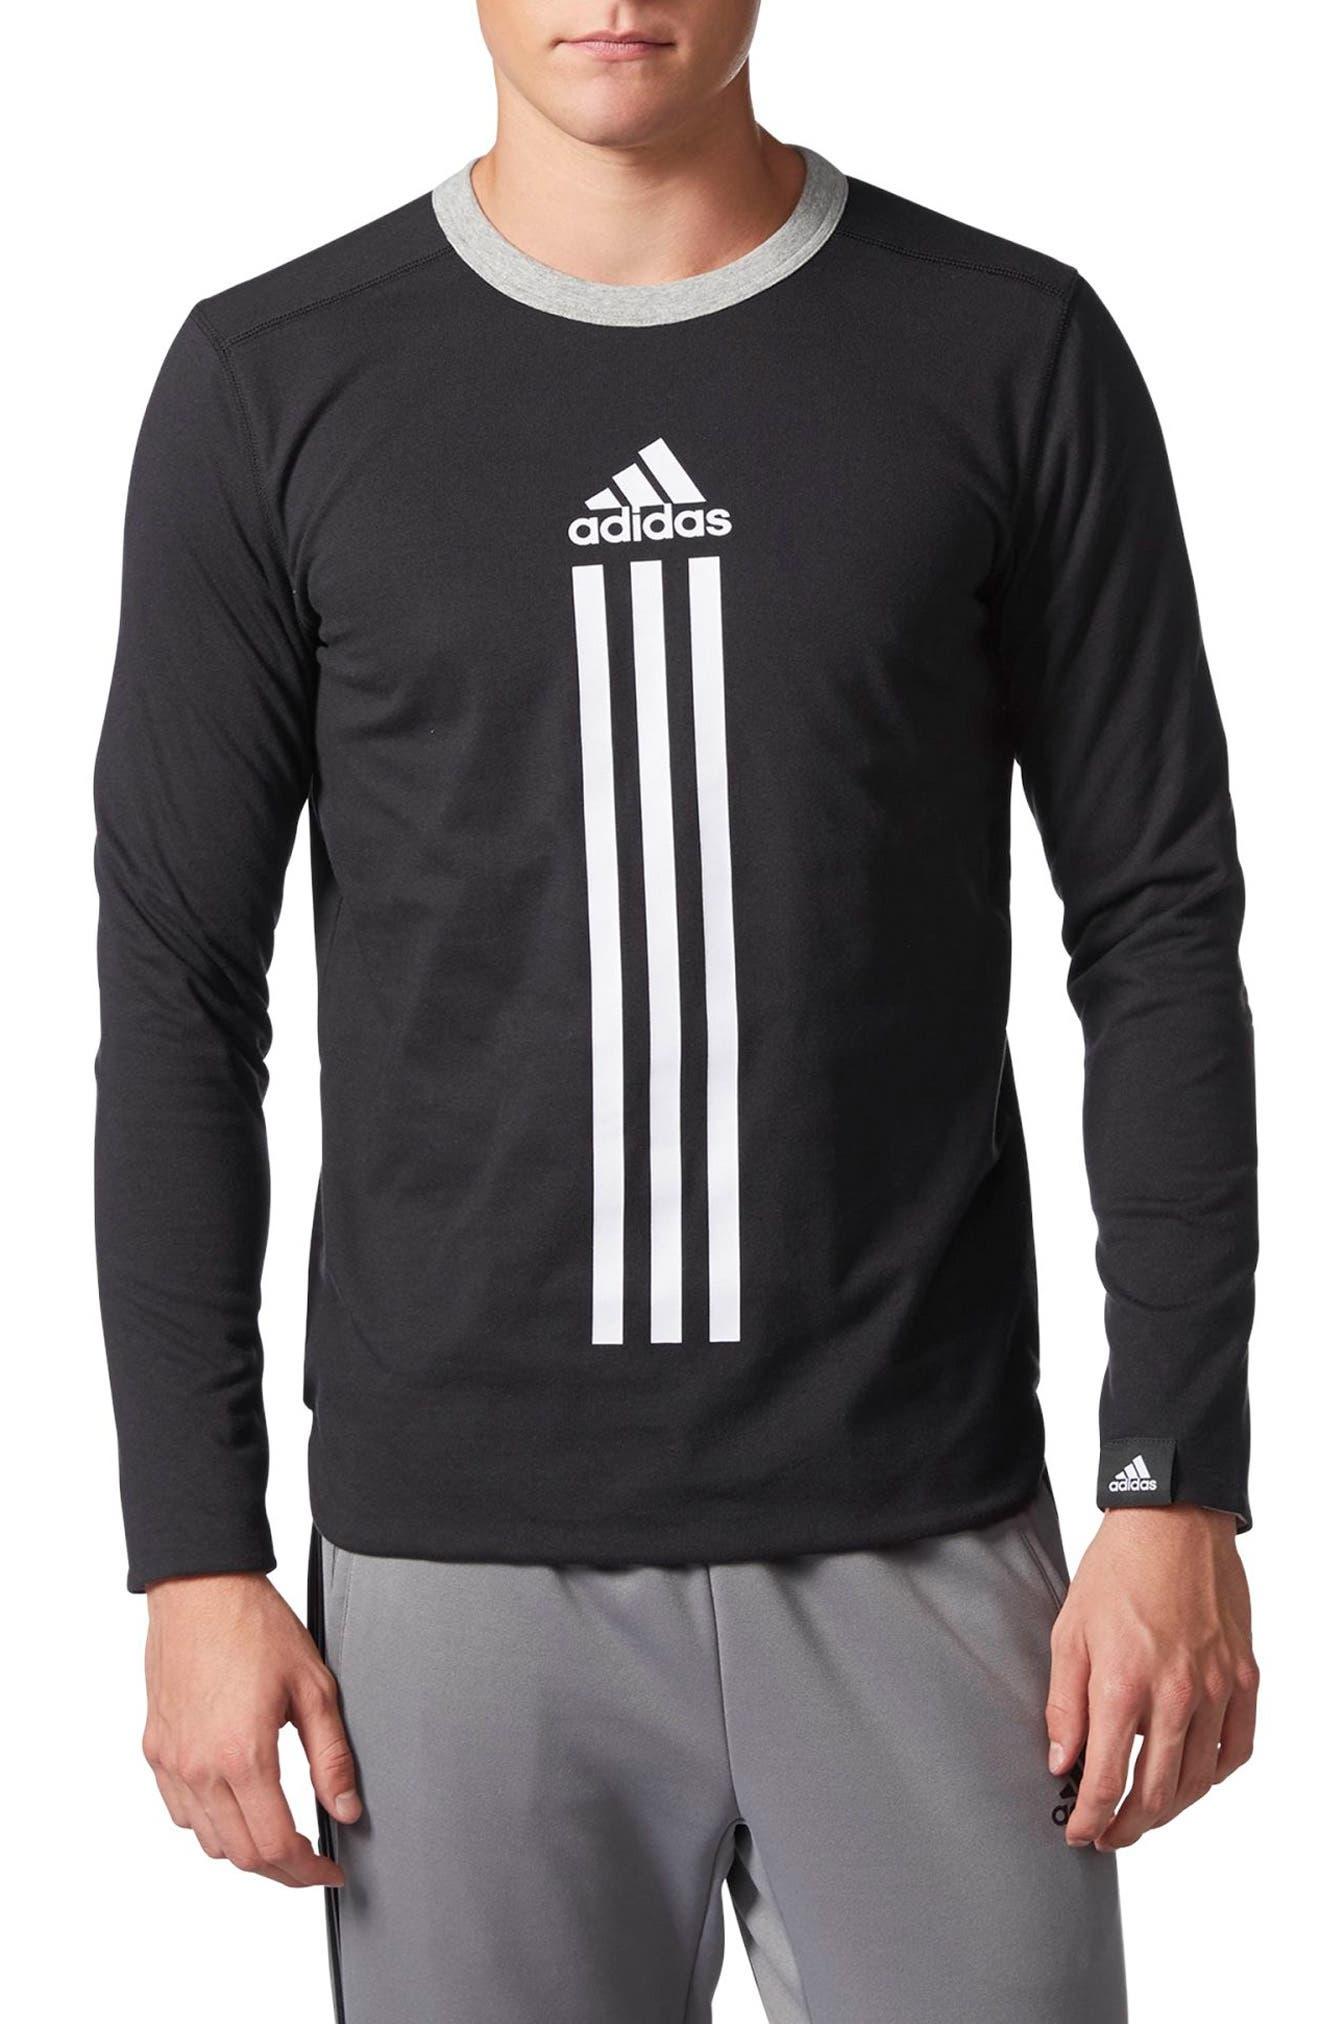 ID Long Sleeve Performance T-Shirt,                             Main thumbnail 1, color,                             Black/ Medium Grey Heather